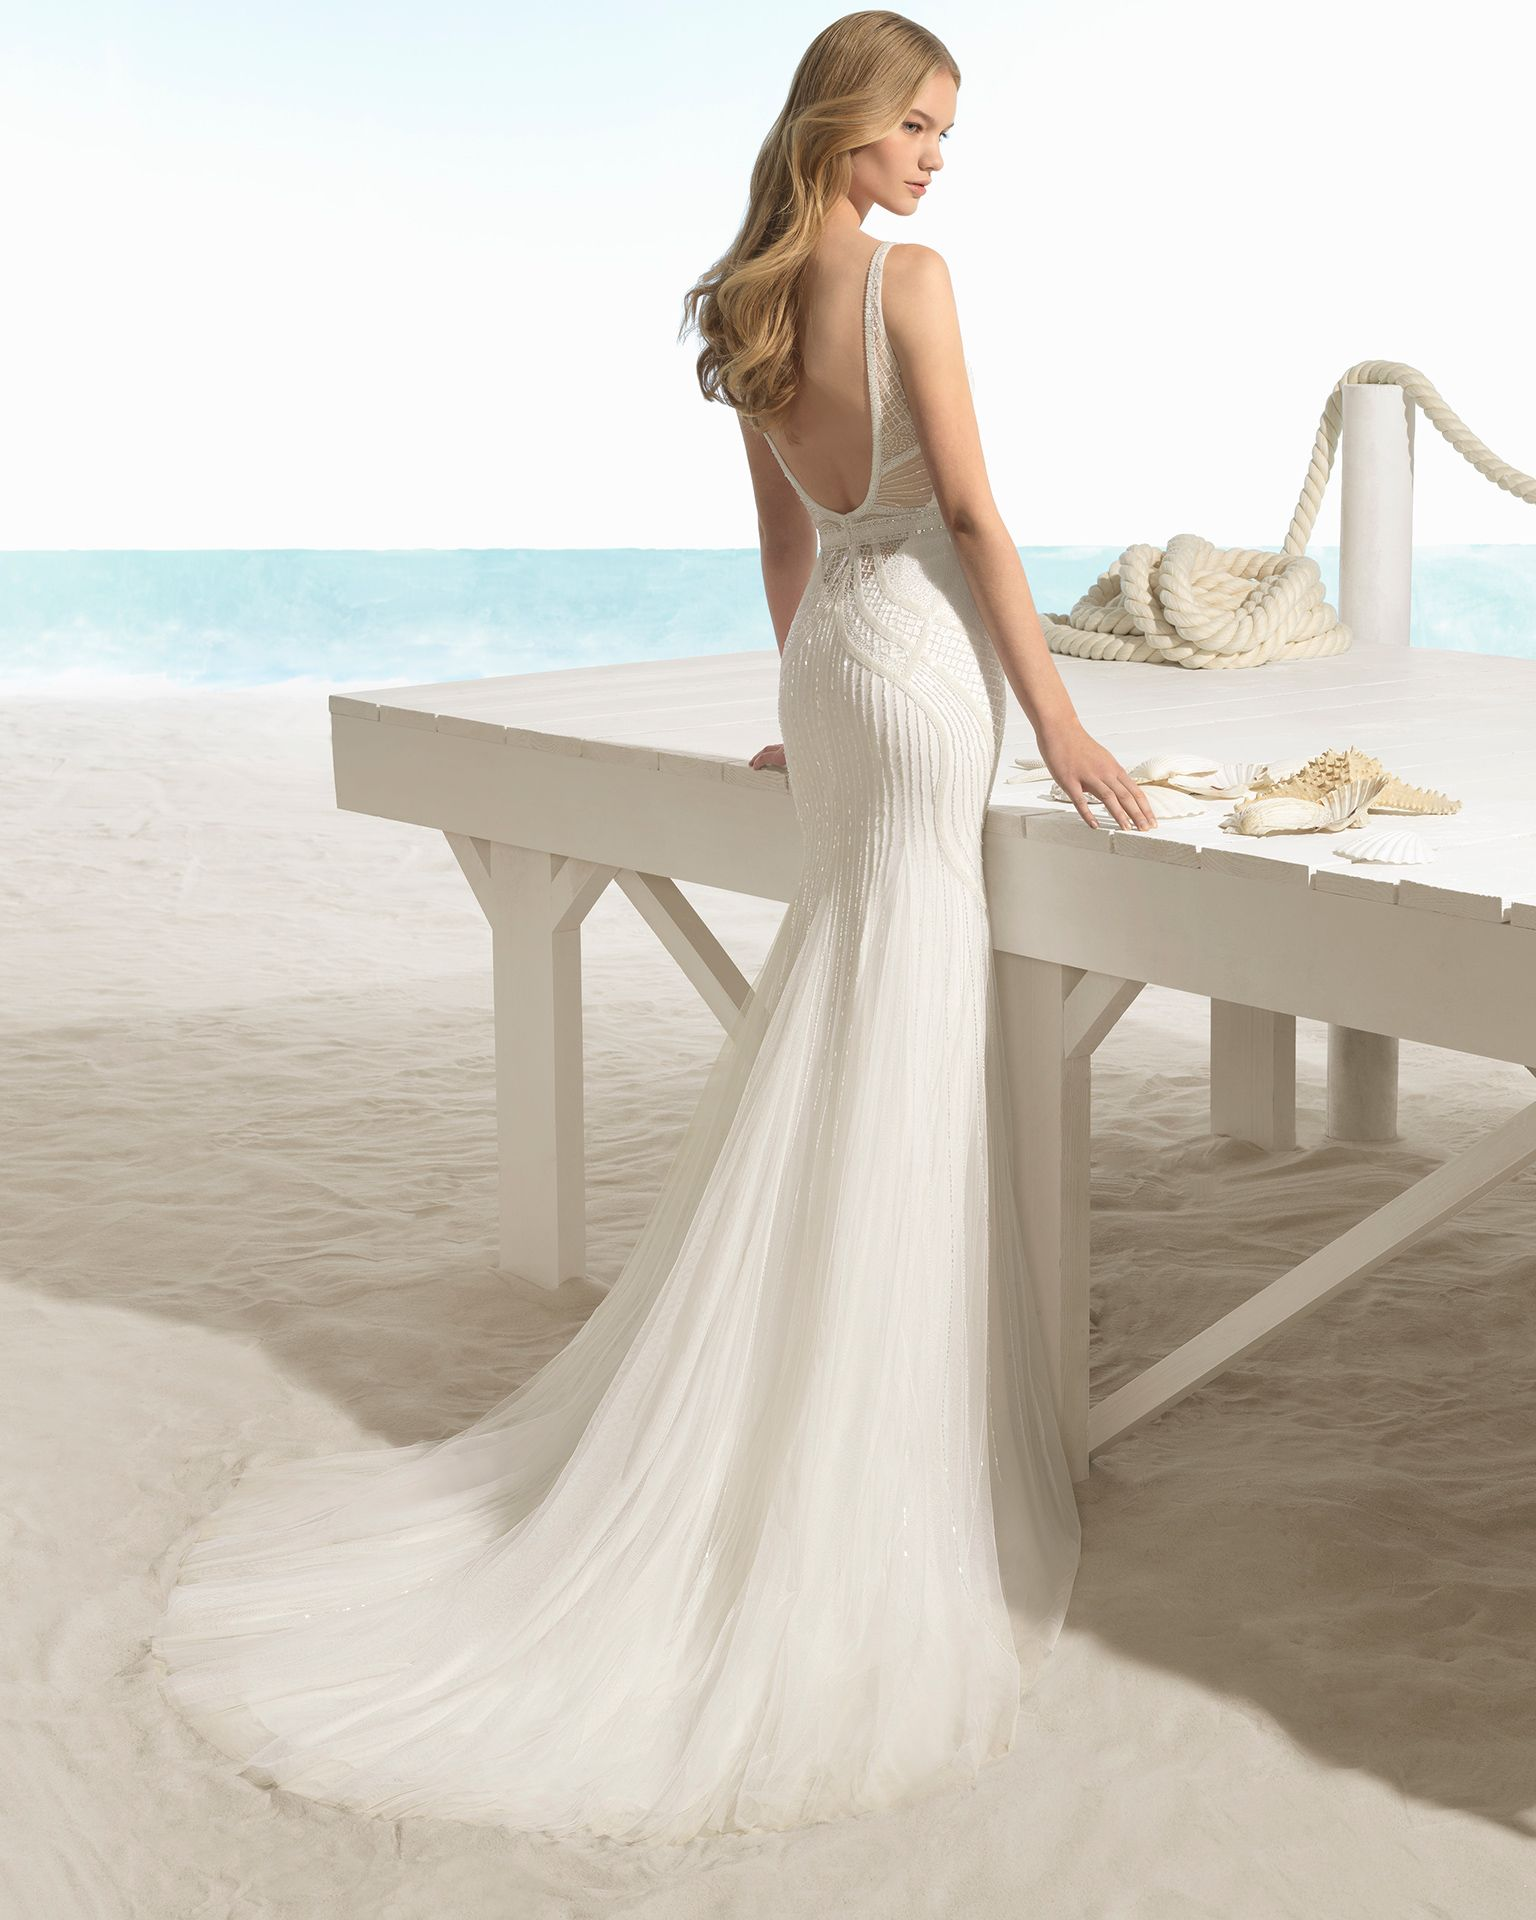 Bohostyle beaded wedding dress with sweetheart neckline and Vback